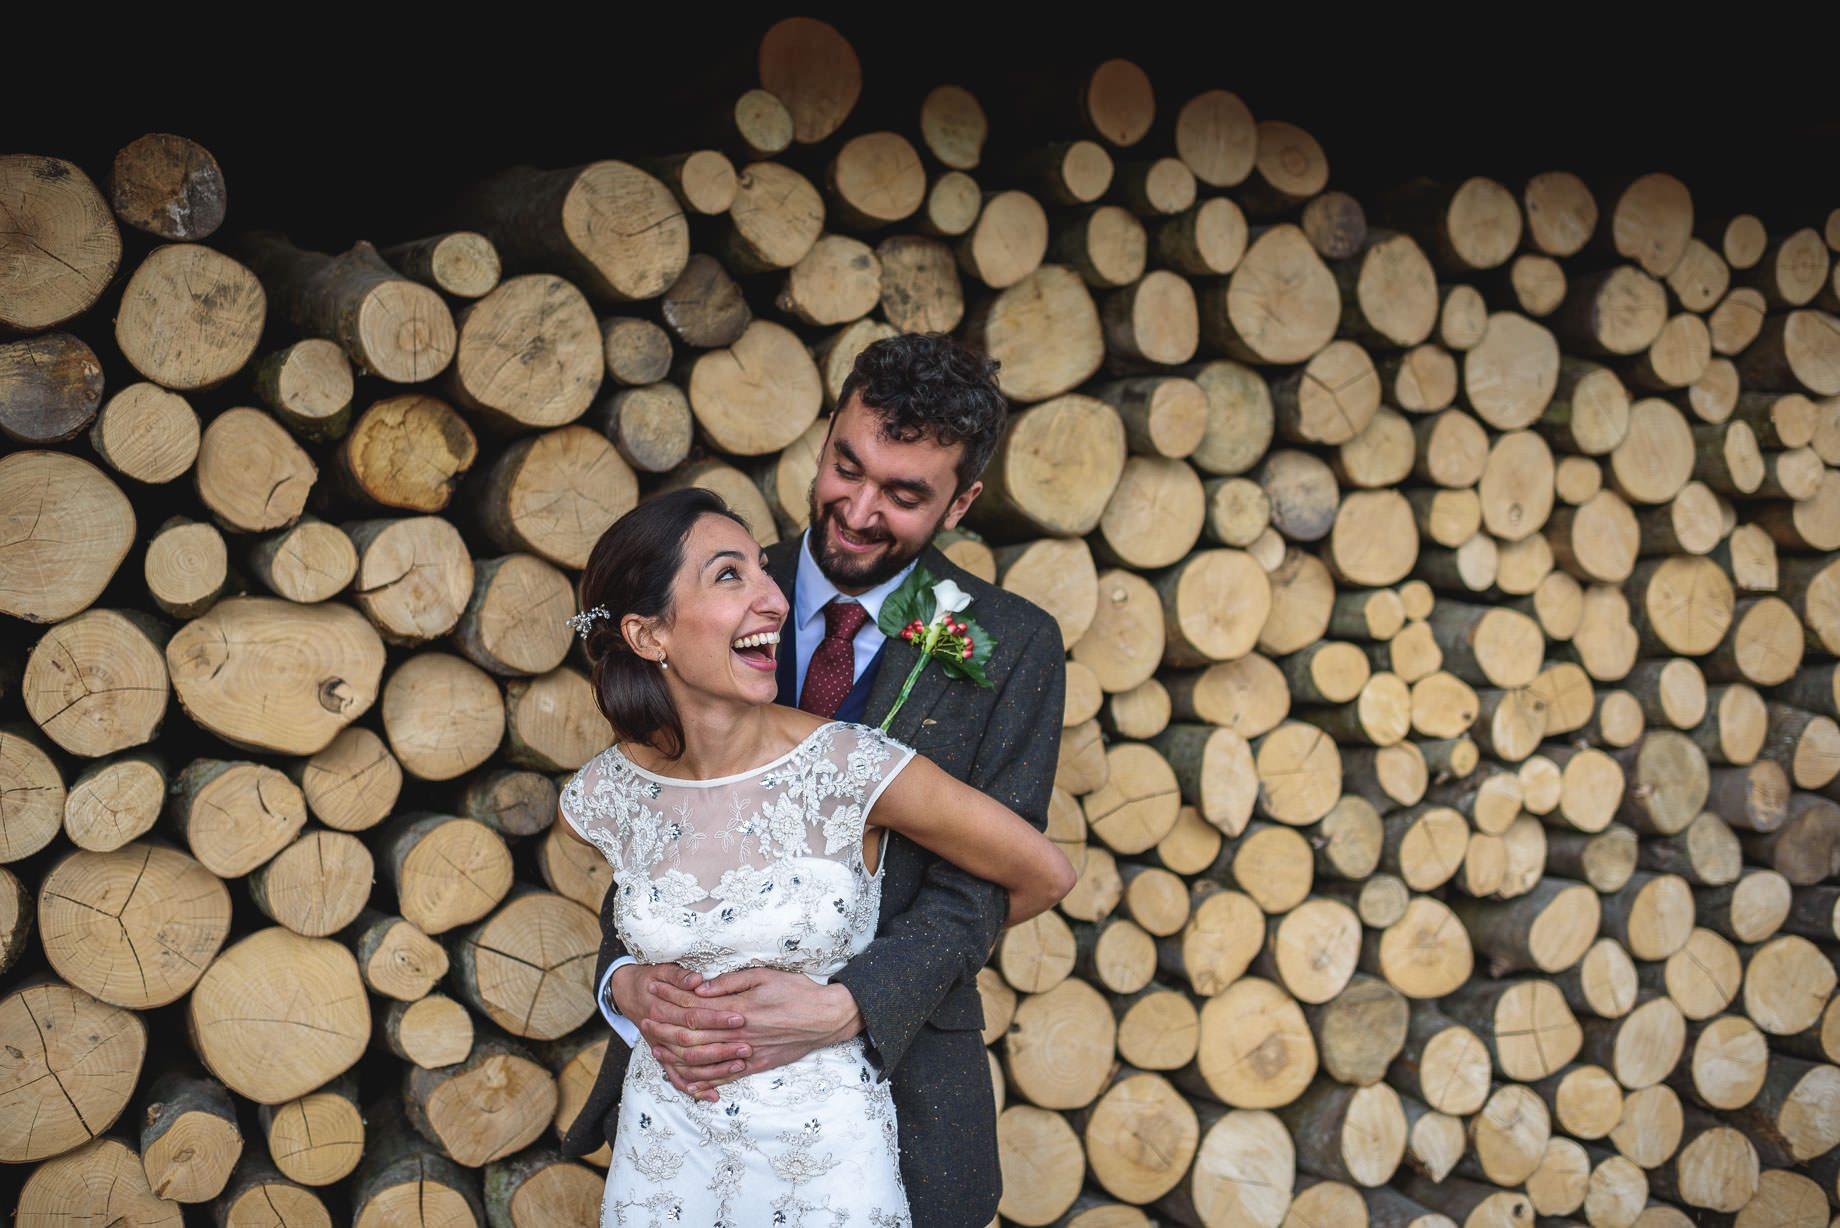 bury-court-barn-wedding-photography-guy-collier-photography-nadia-tom-75-of-184